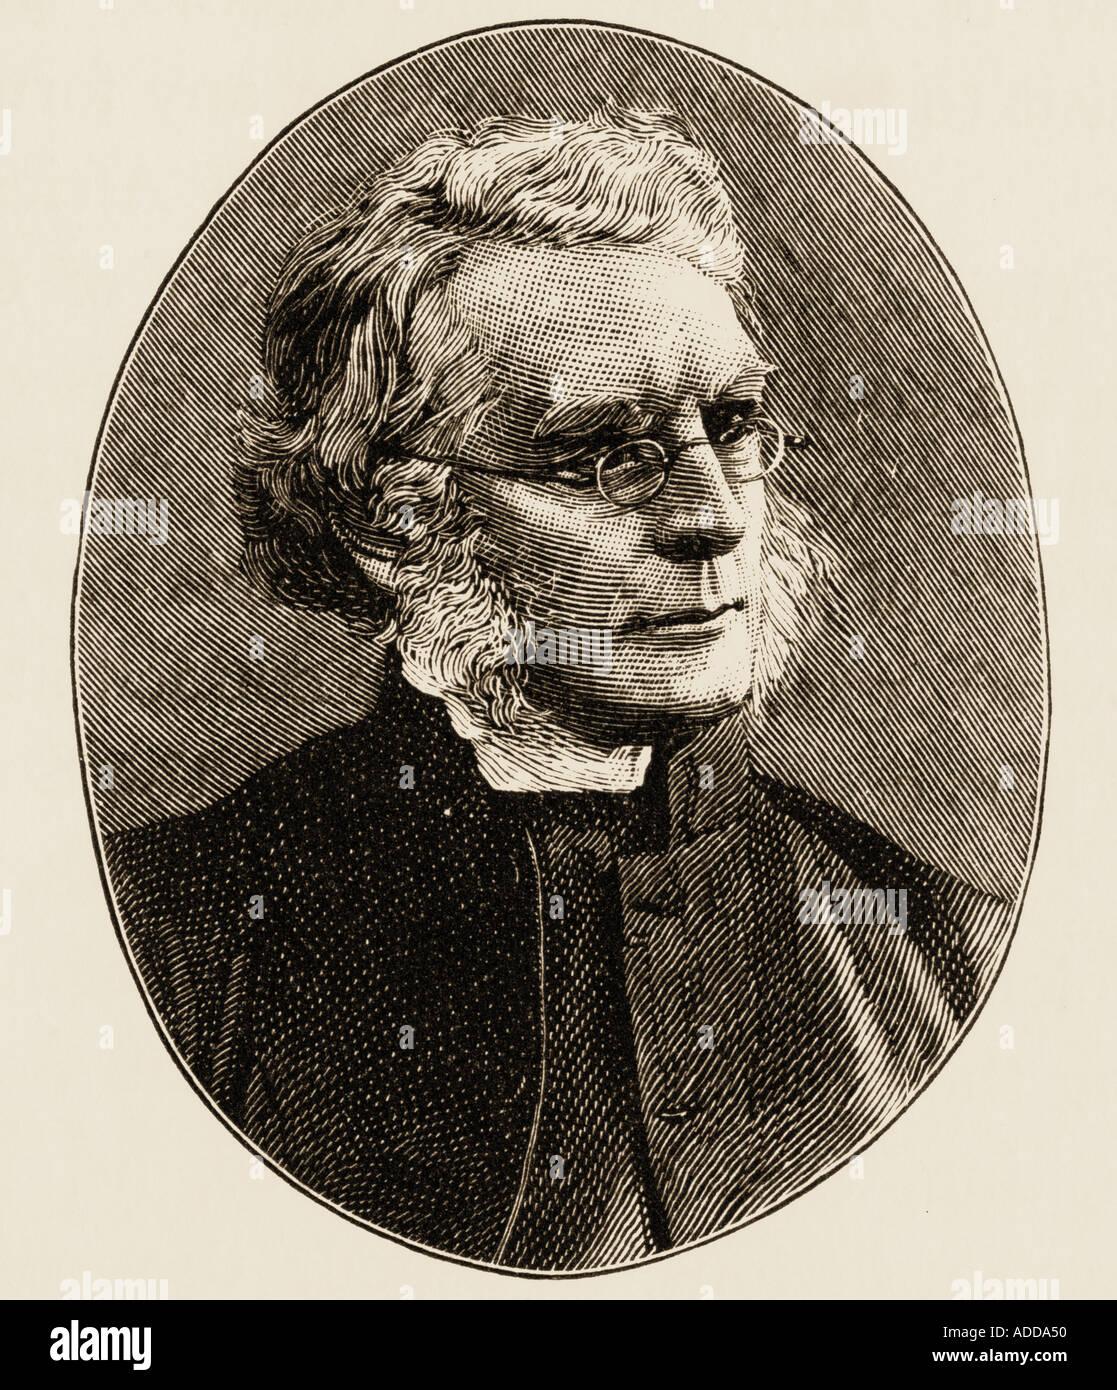 John William Colenso, 1814 -1893. British mathematician, theologian, Biblical scholar, social activist, the first Church of England Bishop of Natal. - Stock Image